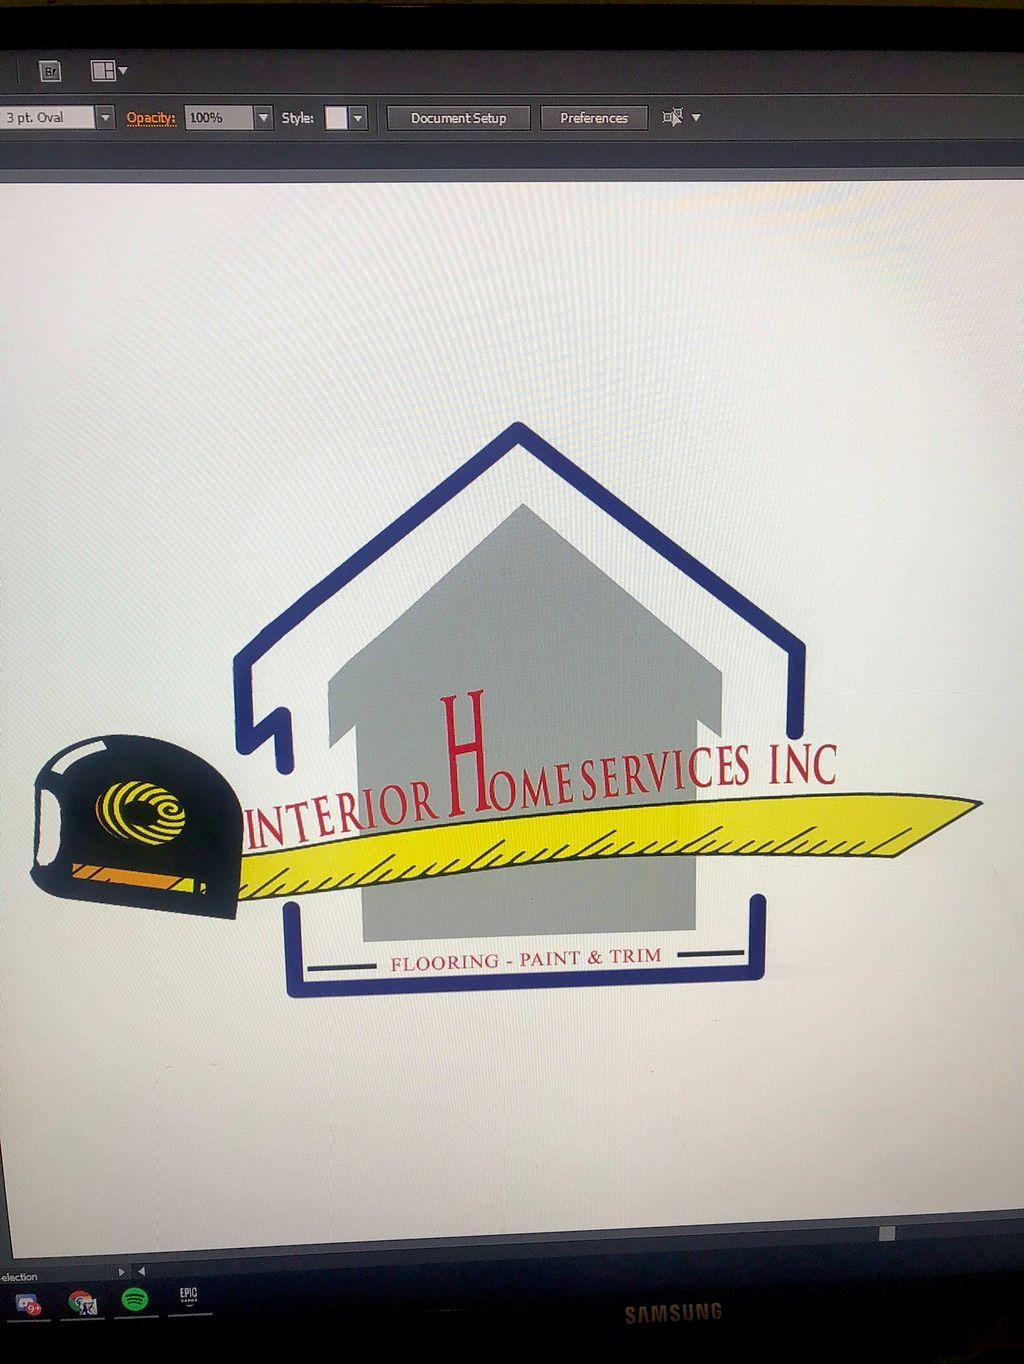 Interior home services inc.